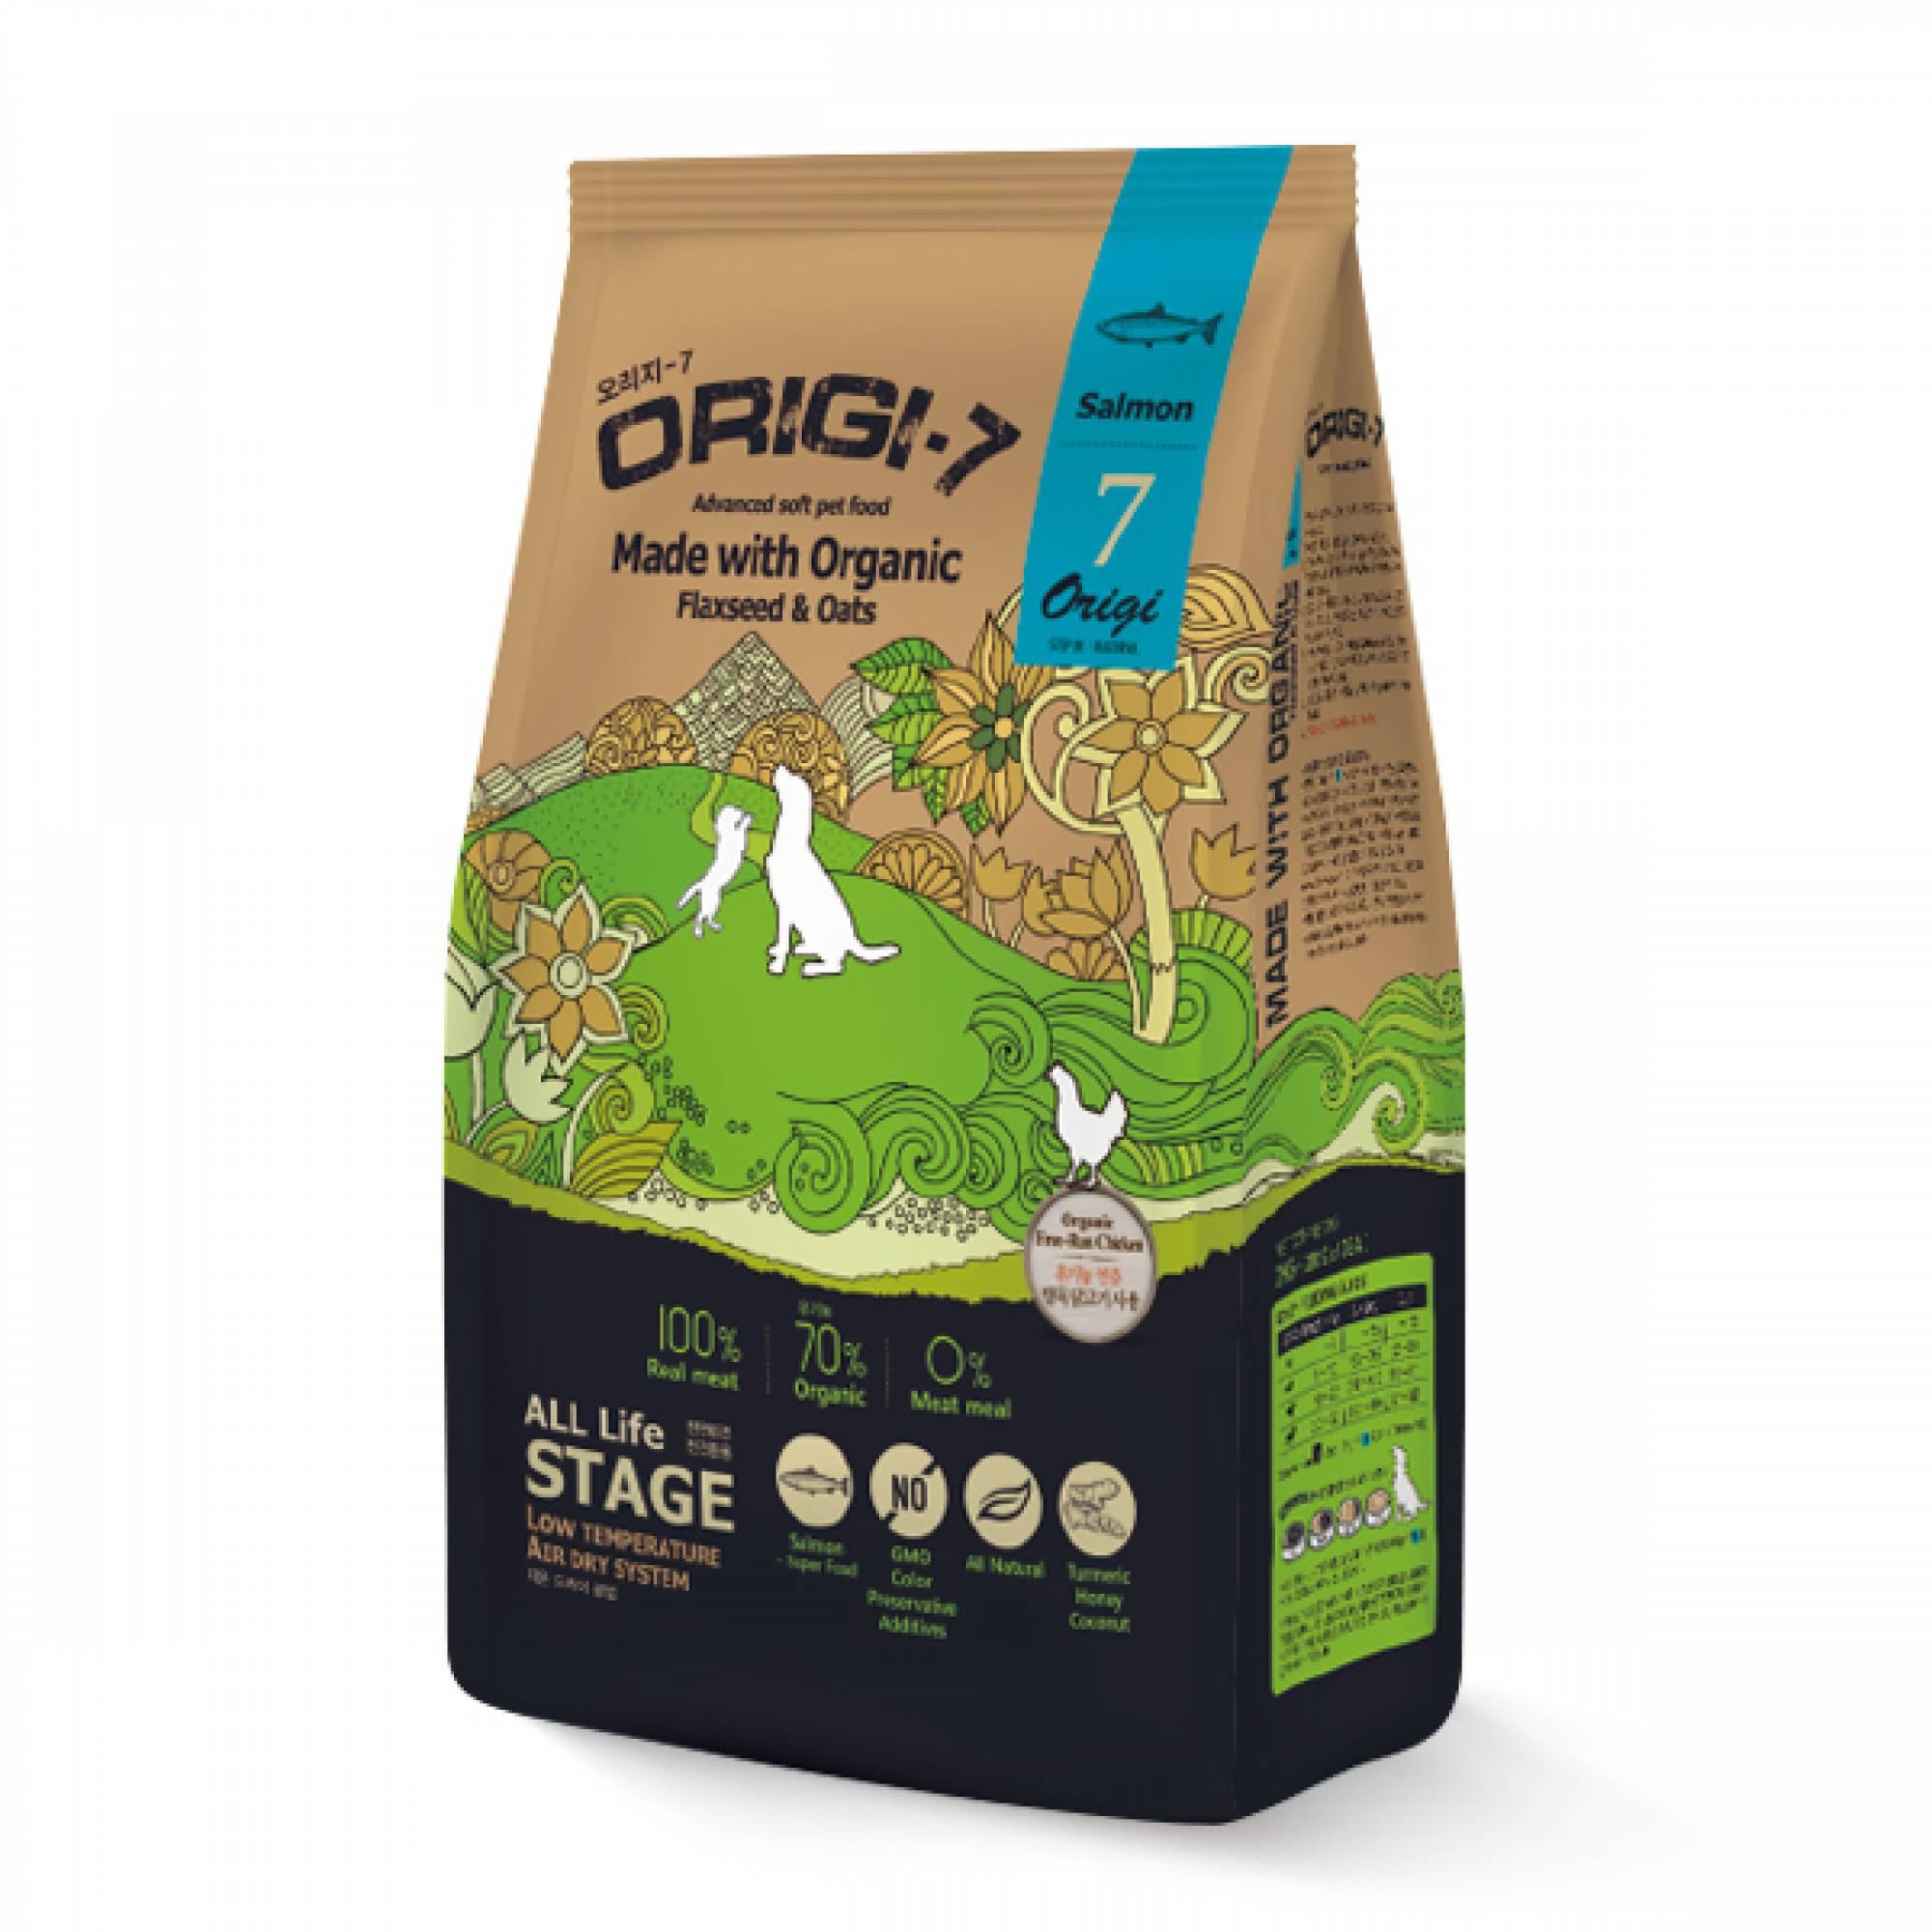 Bow Wow - Dog Origi-7 Air-Dried Advanced Soft Pet Food - Salmon 1.2kg (200g x 6 bags)